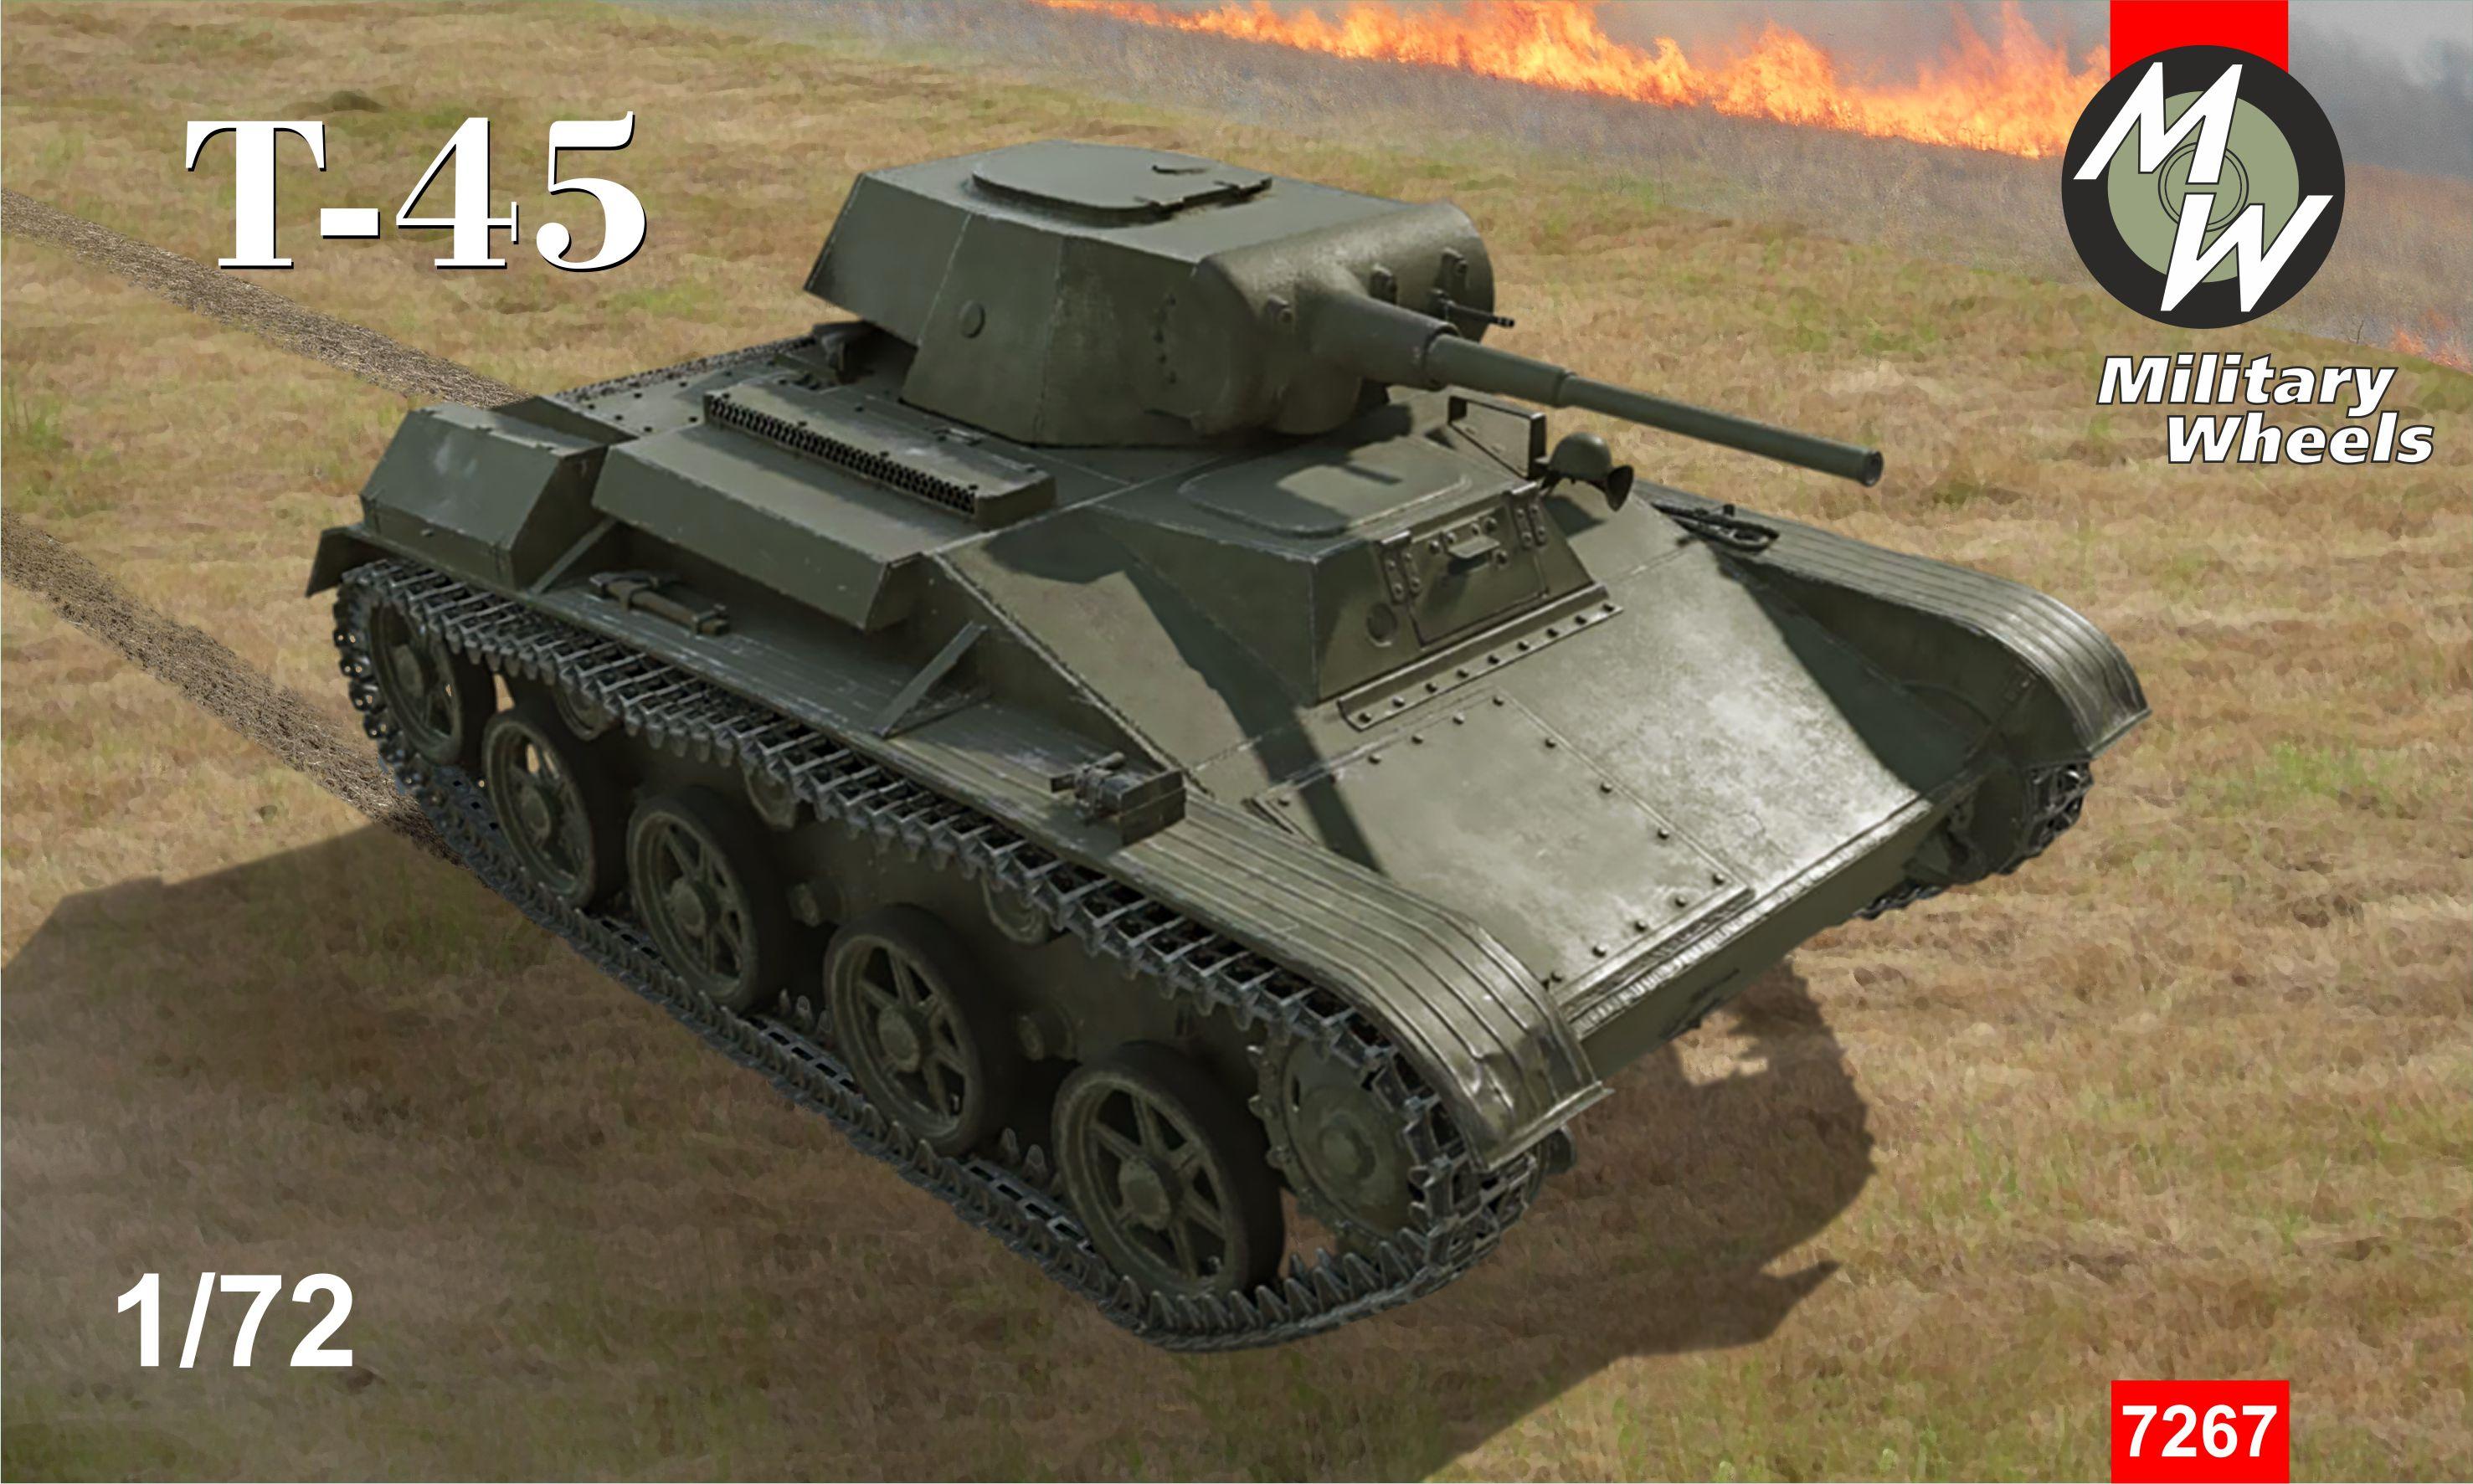 MW7267